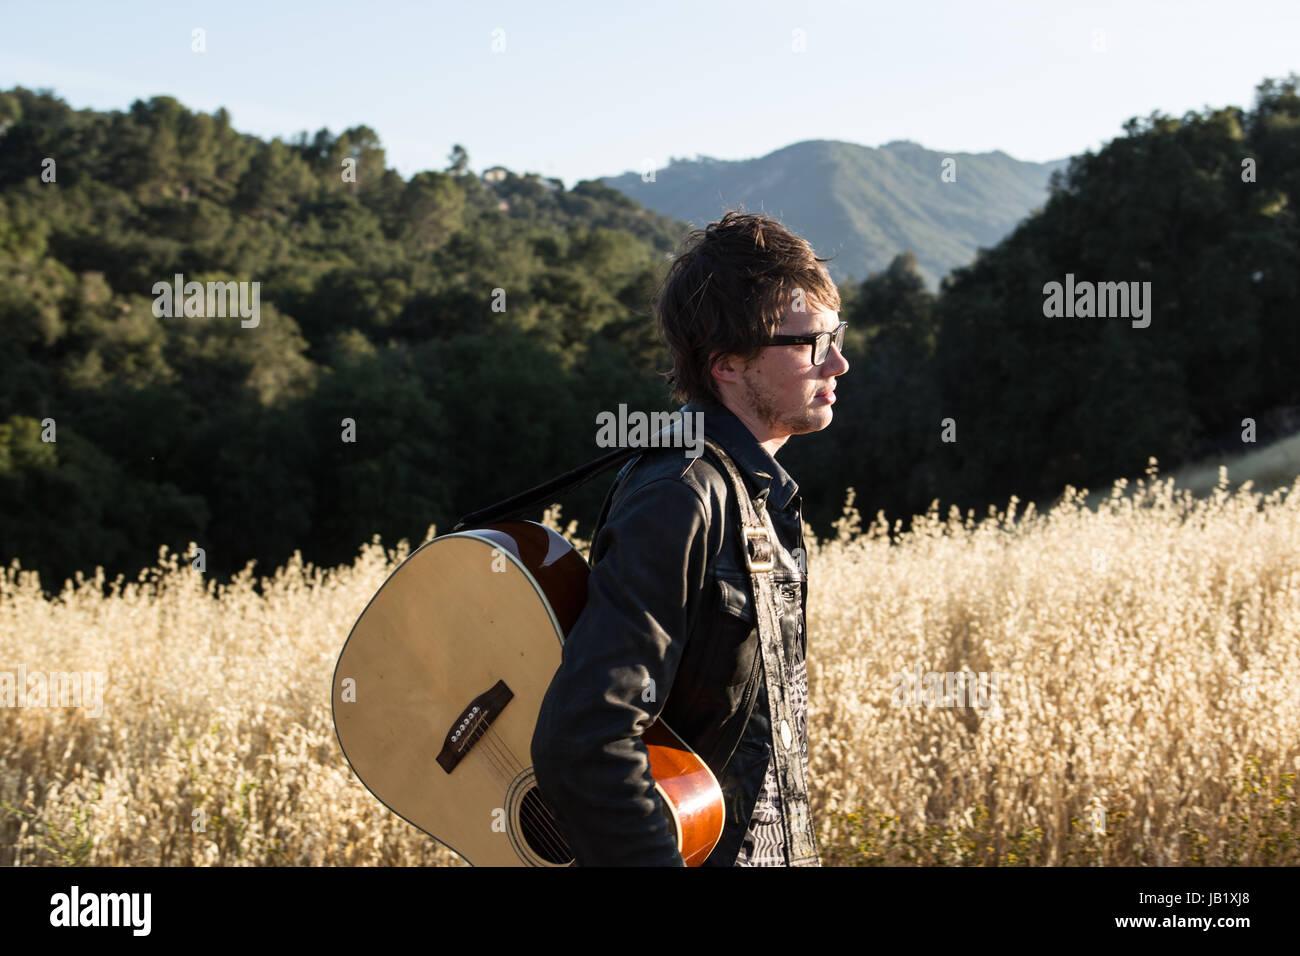 music - Stock Image